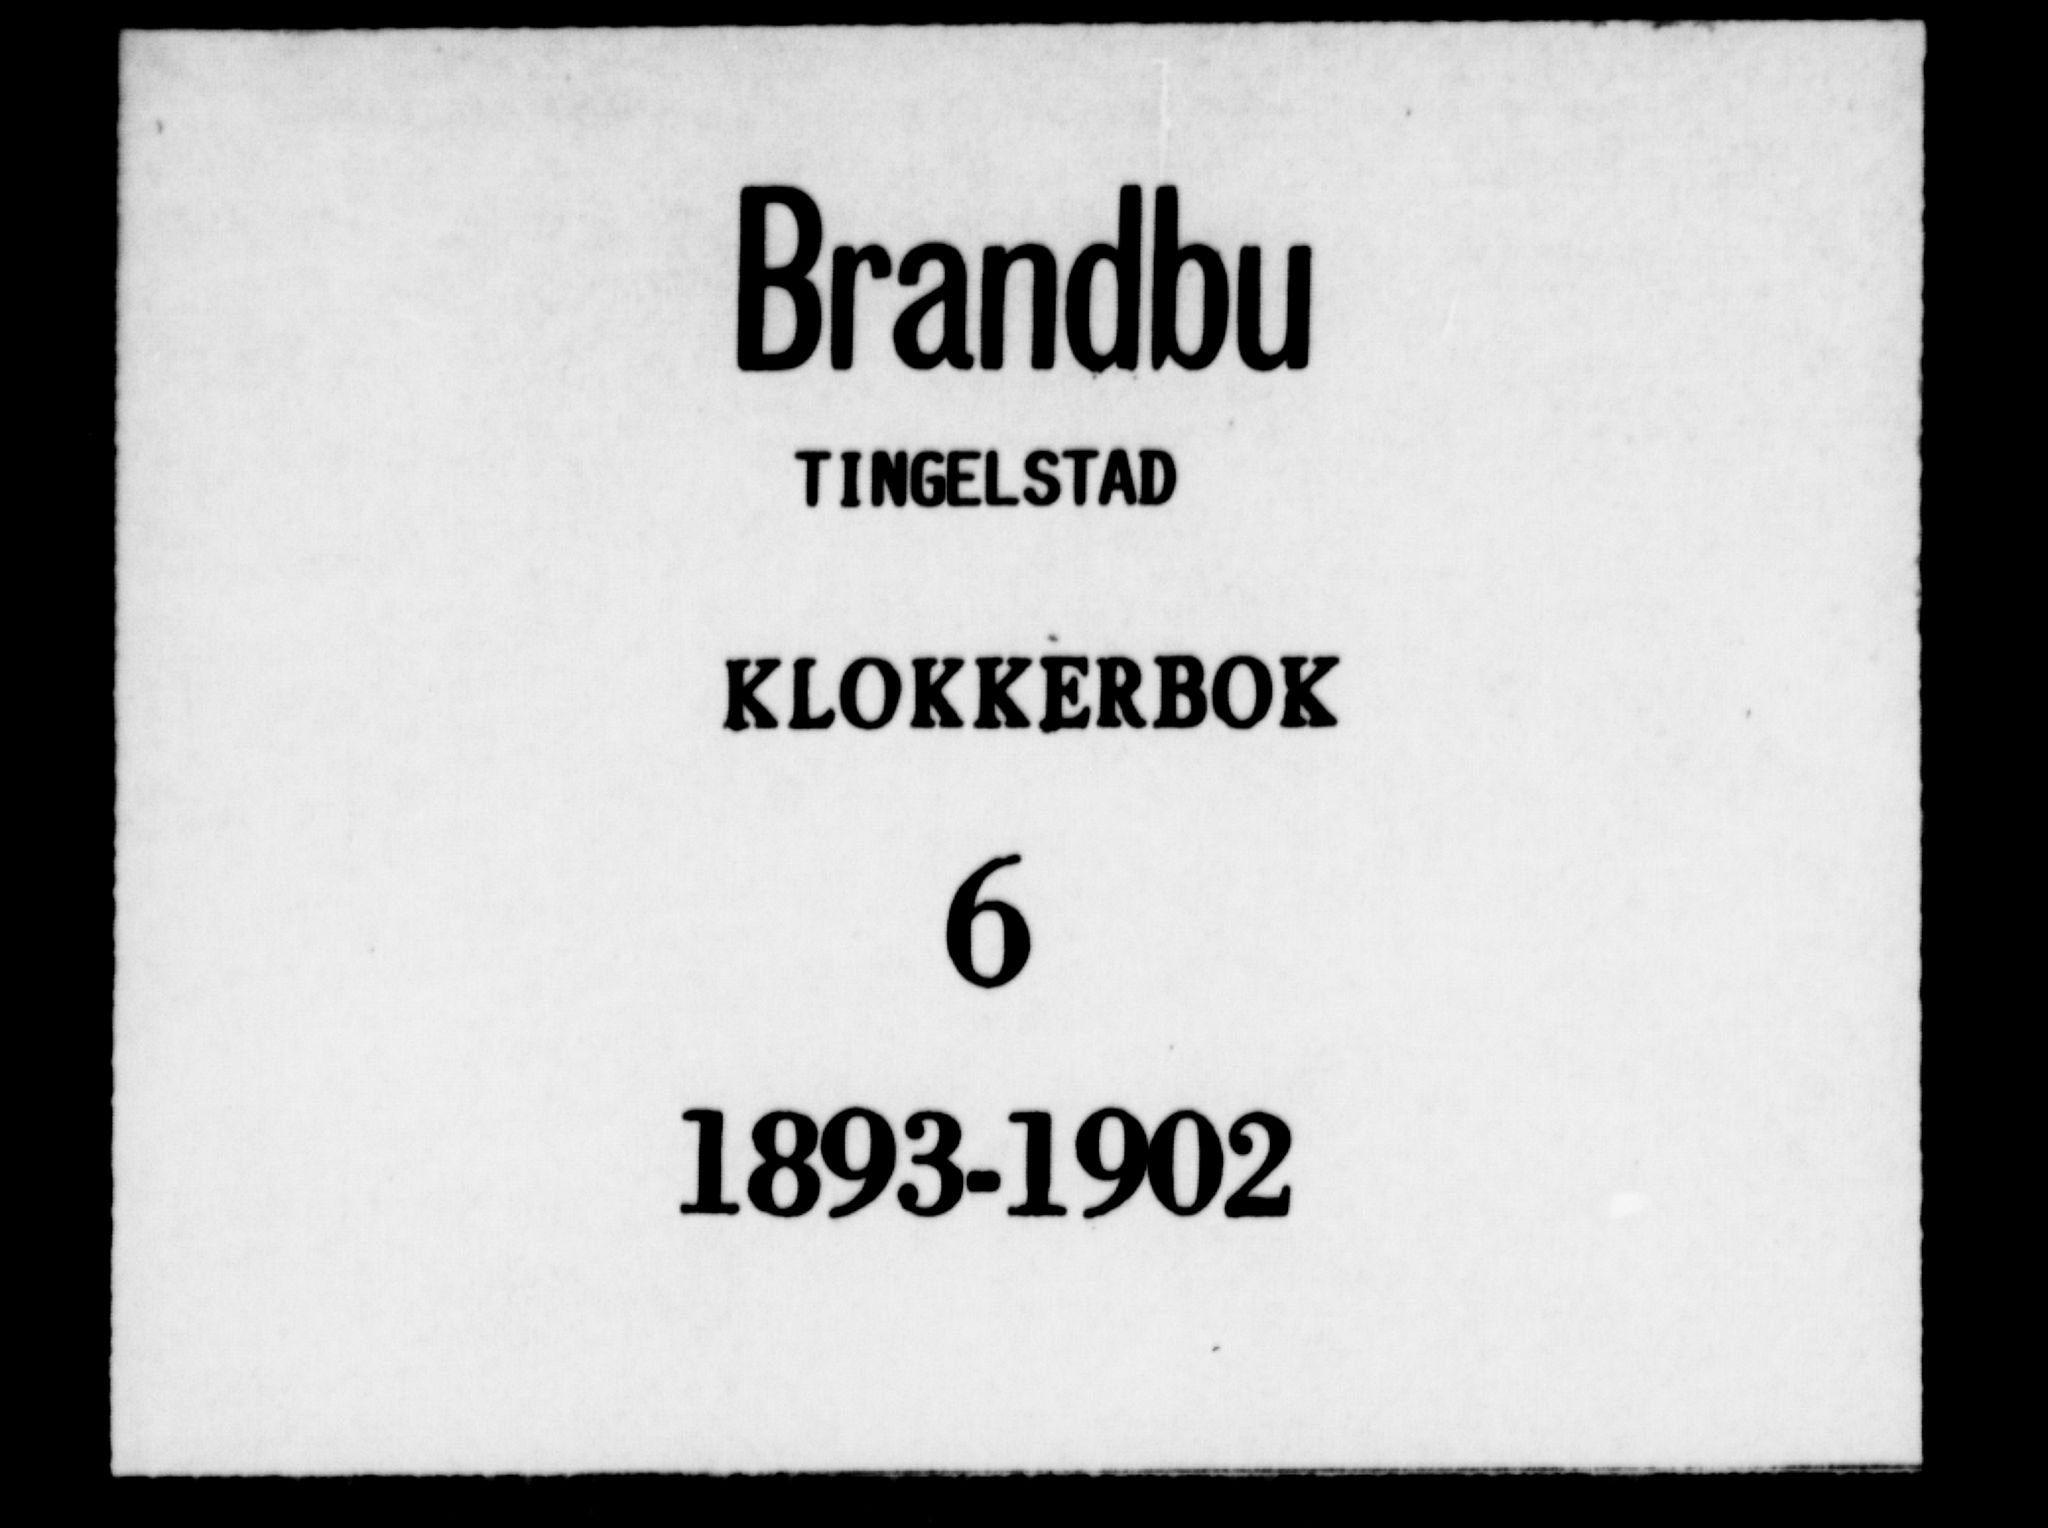 SAH, Brandbu prestekontor, Klokkerbok nr. 6, 1893-1902